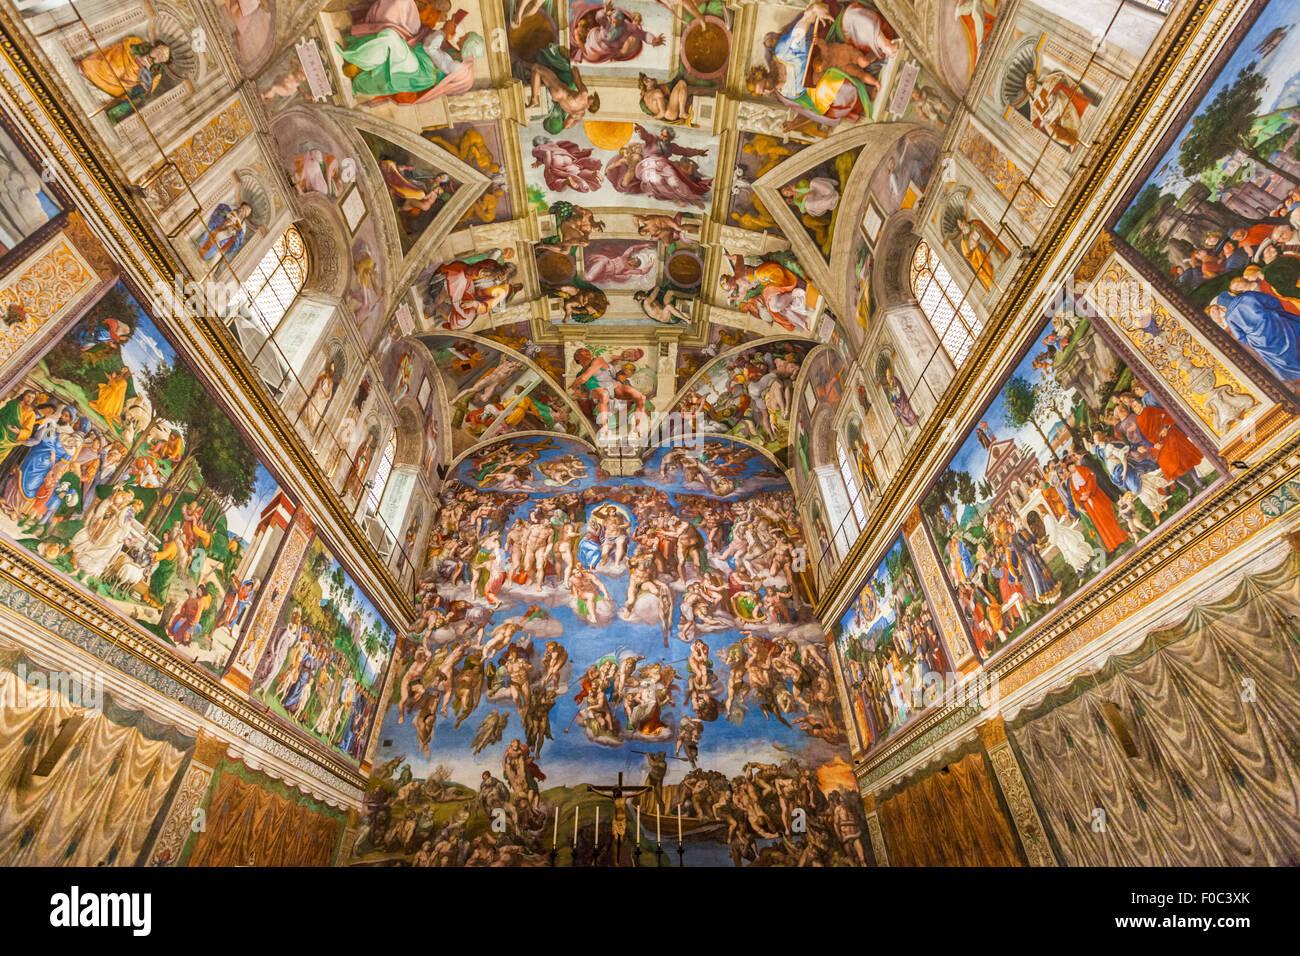 La Capilla Sixtina del Palacio Apostólico Vaticano Museo Vaticano Roma Italia Europa UE Imagen De Stock